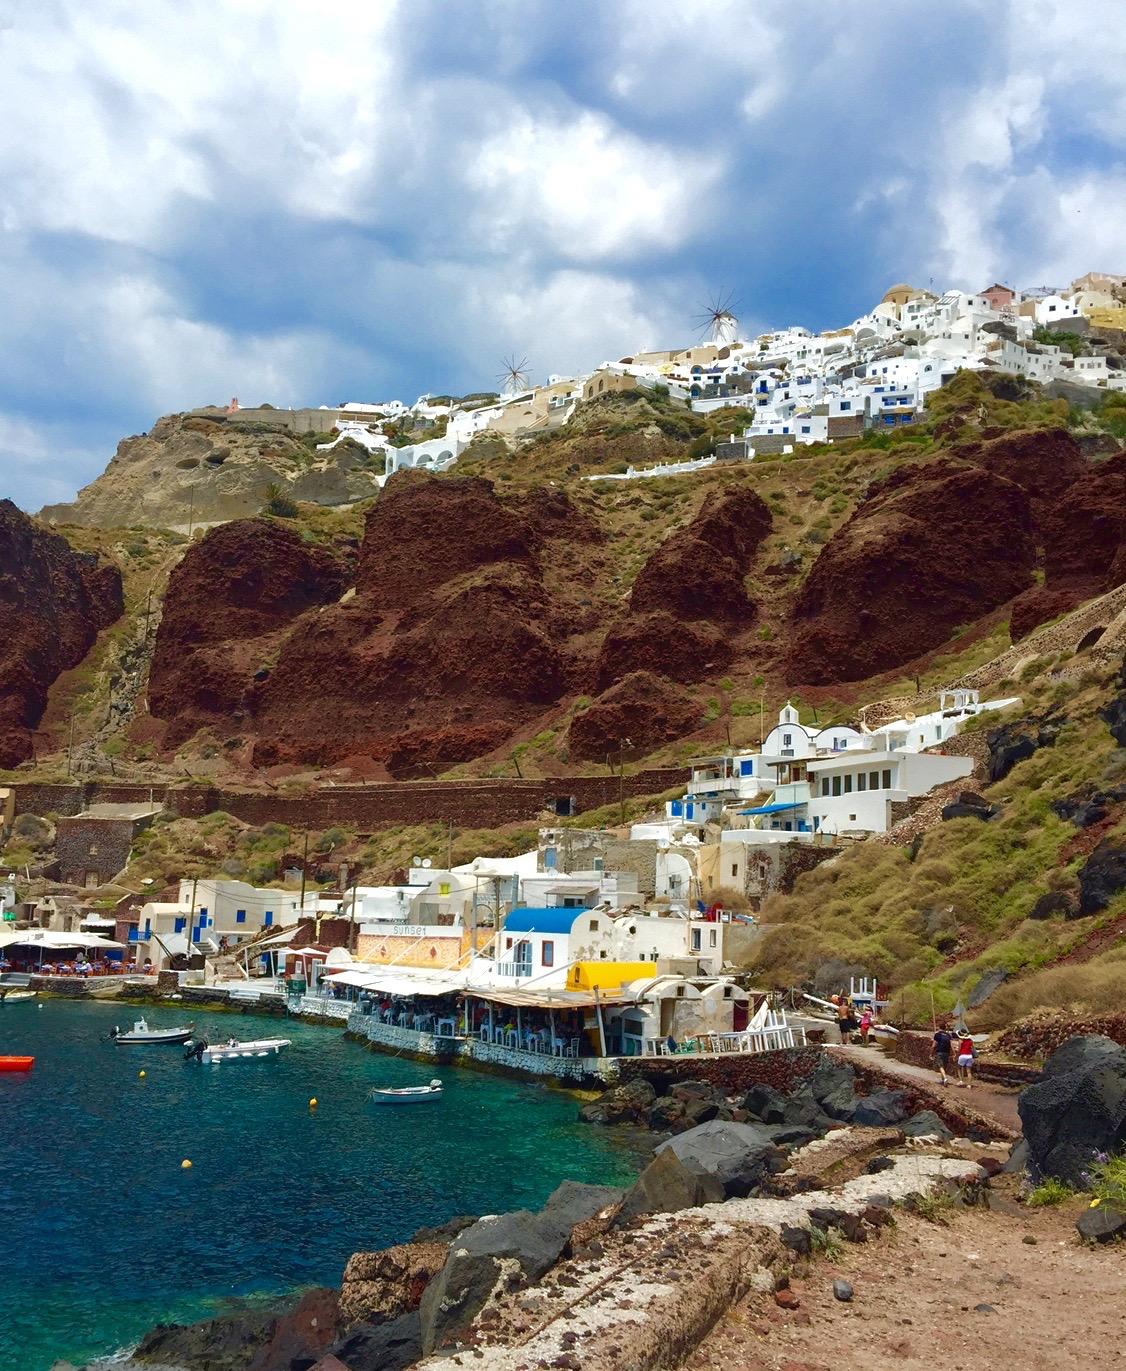 Fishing village, Amoudi Bay Greek Islands Greece - 3 Days*